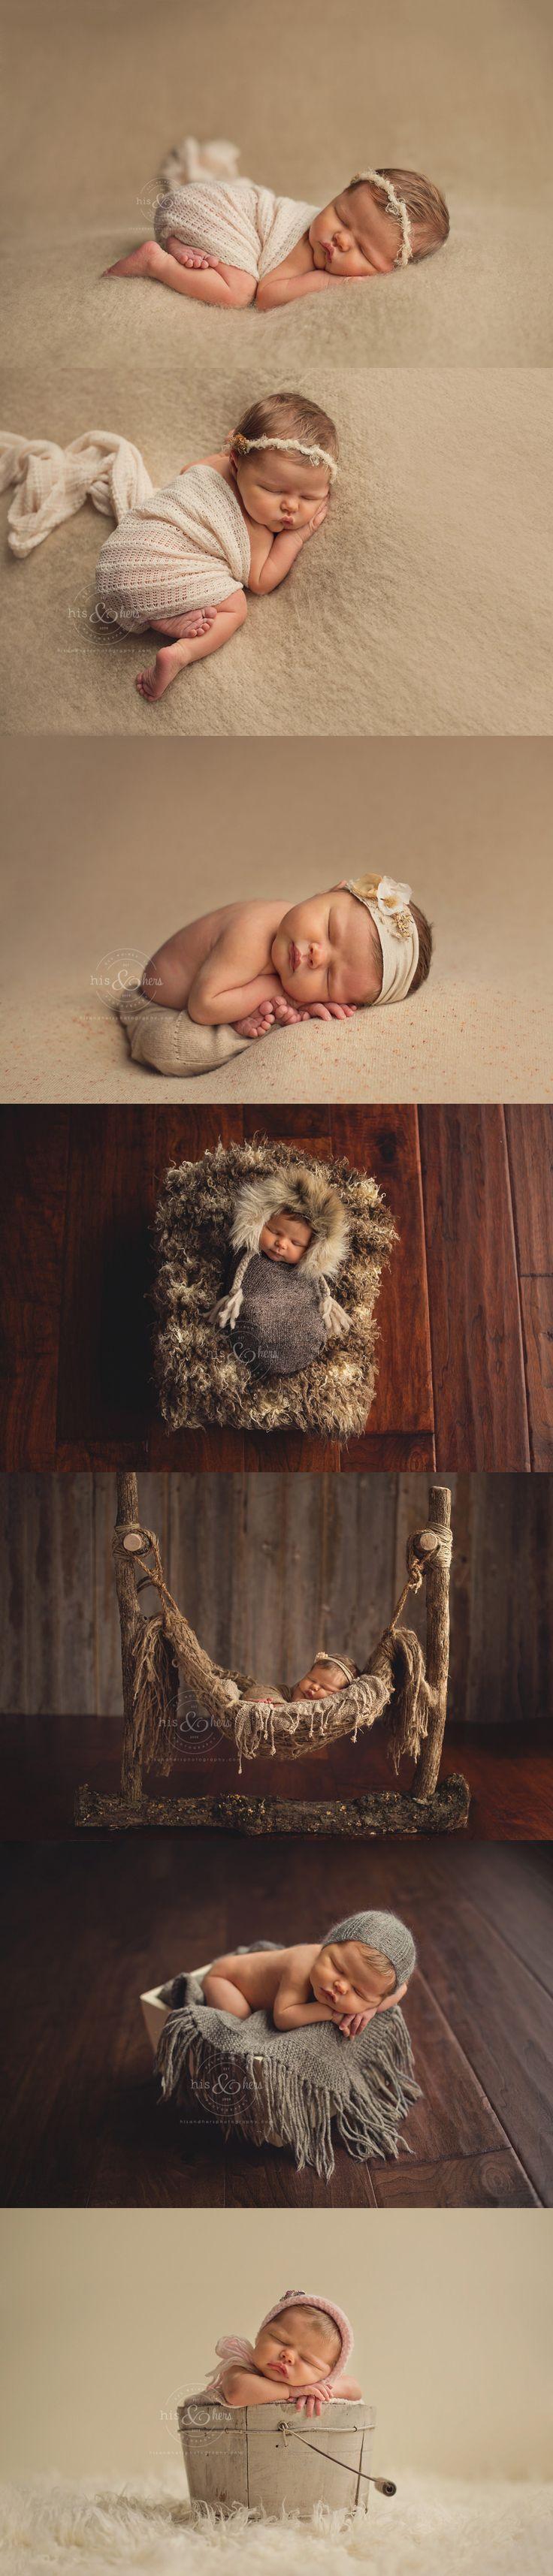 Des Moines, Iowa newborn photographer, Darcy Milder | His & Hers | 3 day old Kassidy